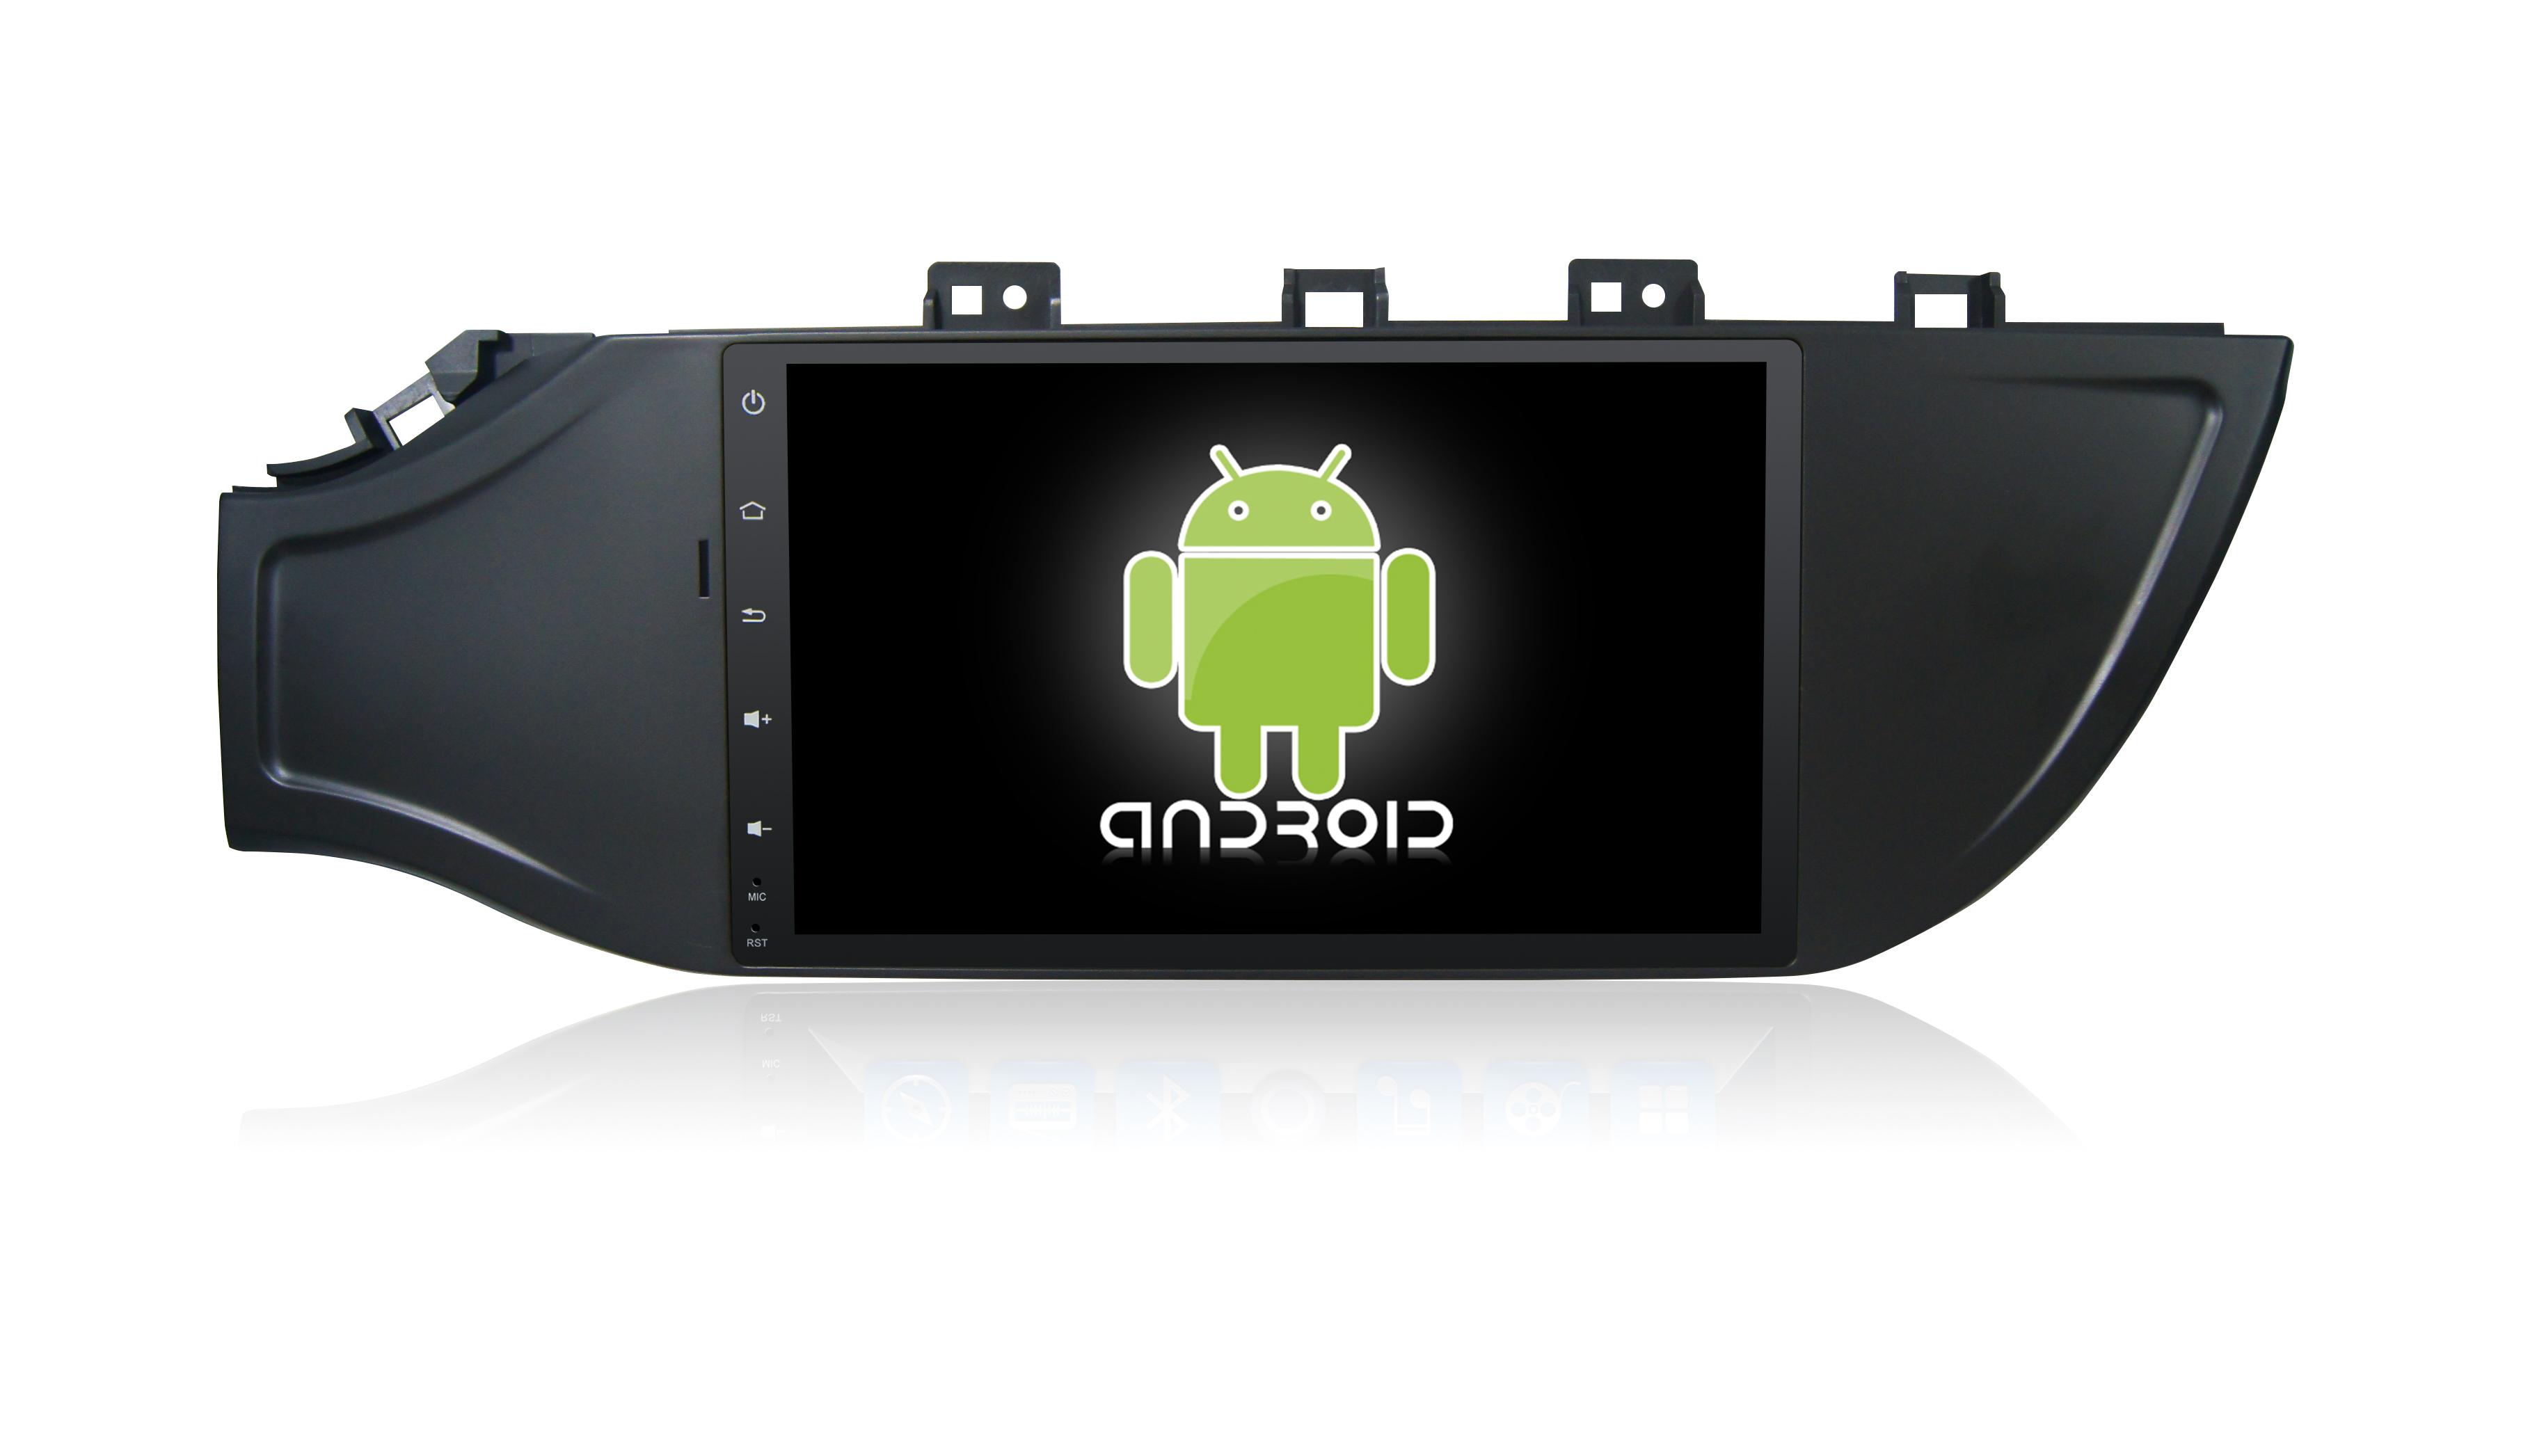 Штатная магнитола CARMEDIA KR-9047-T8 для Kia Rio 2017+ Android 7.1.2 k1 android 5 1 os smart watch phone mtk6580 512mb 8gb support wifi sim card bluetooth gps smartwatch for ios android os